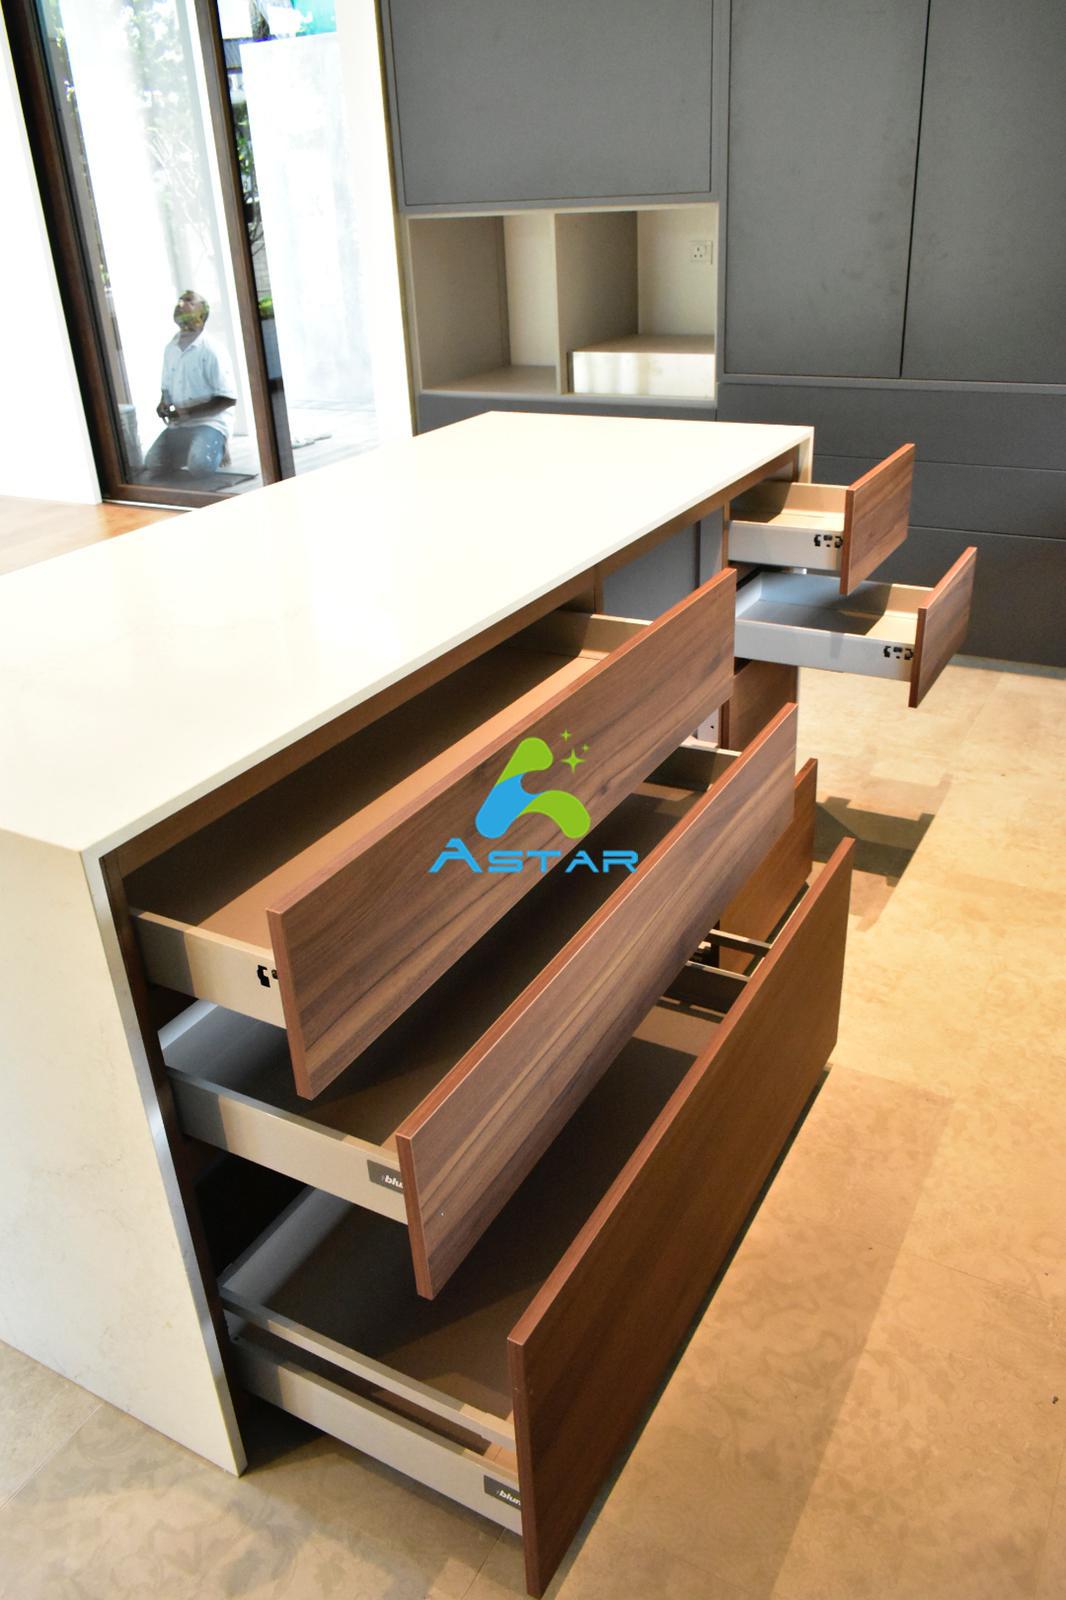 astar furnishing complete projects aluminium kitchen cabinet vanity cabinet wardrobe gardenia road 15